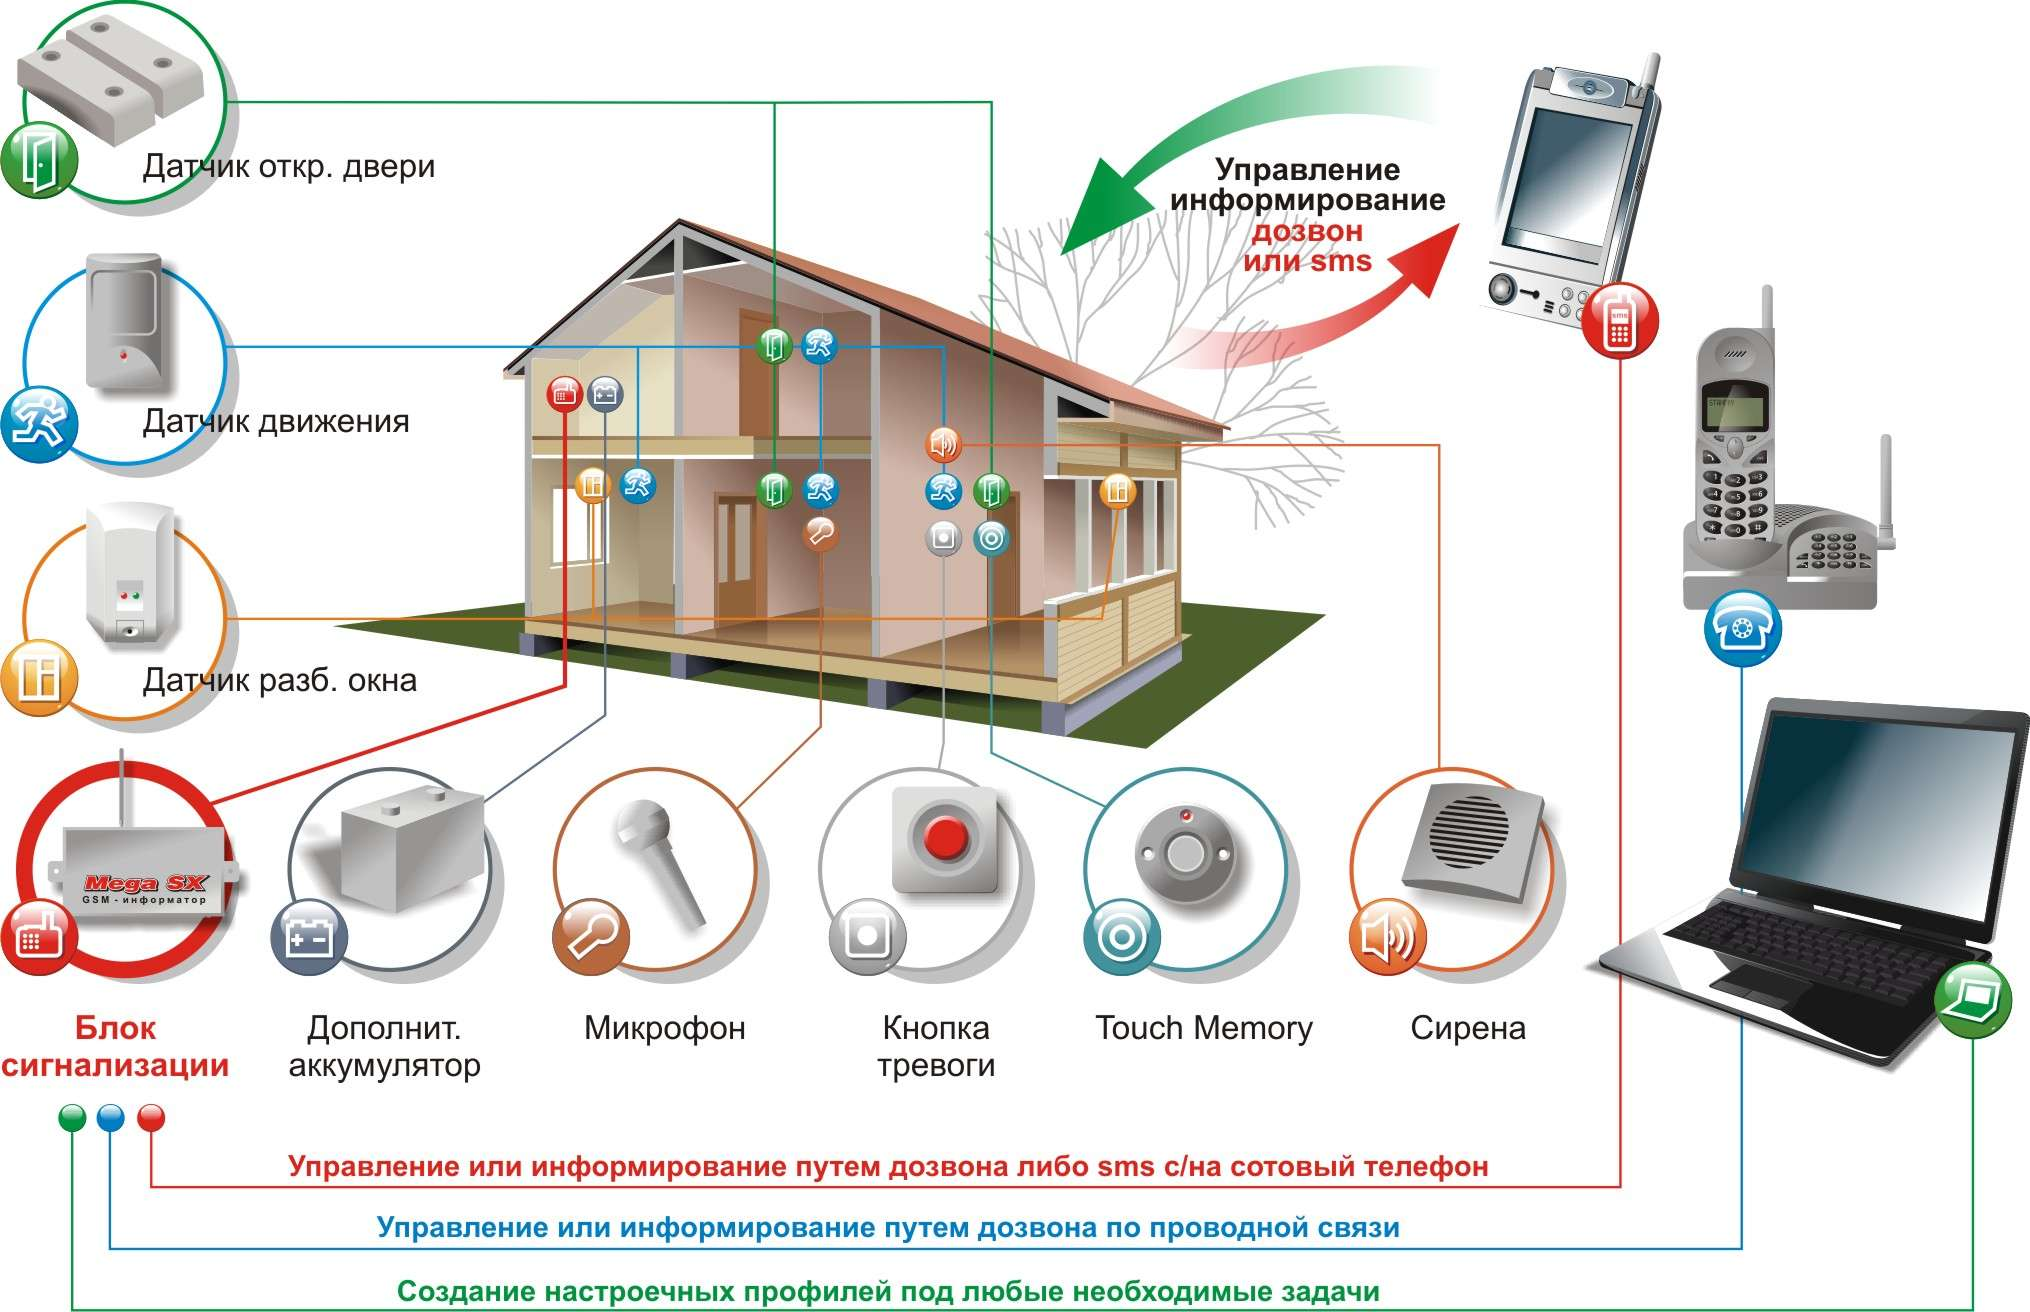 охранная сигнализация gsm для дома